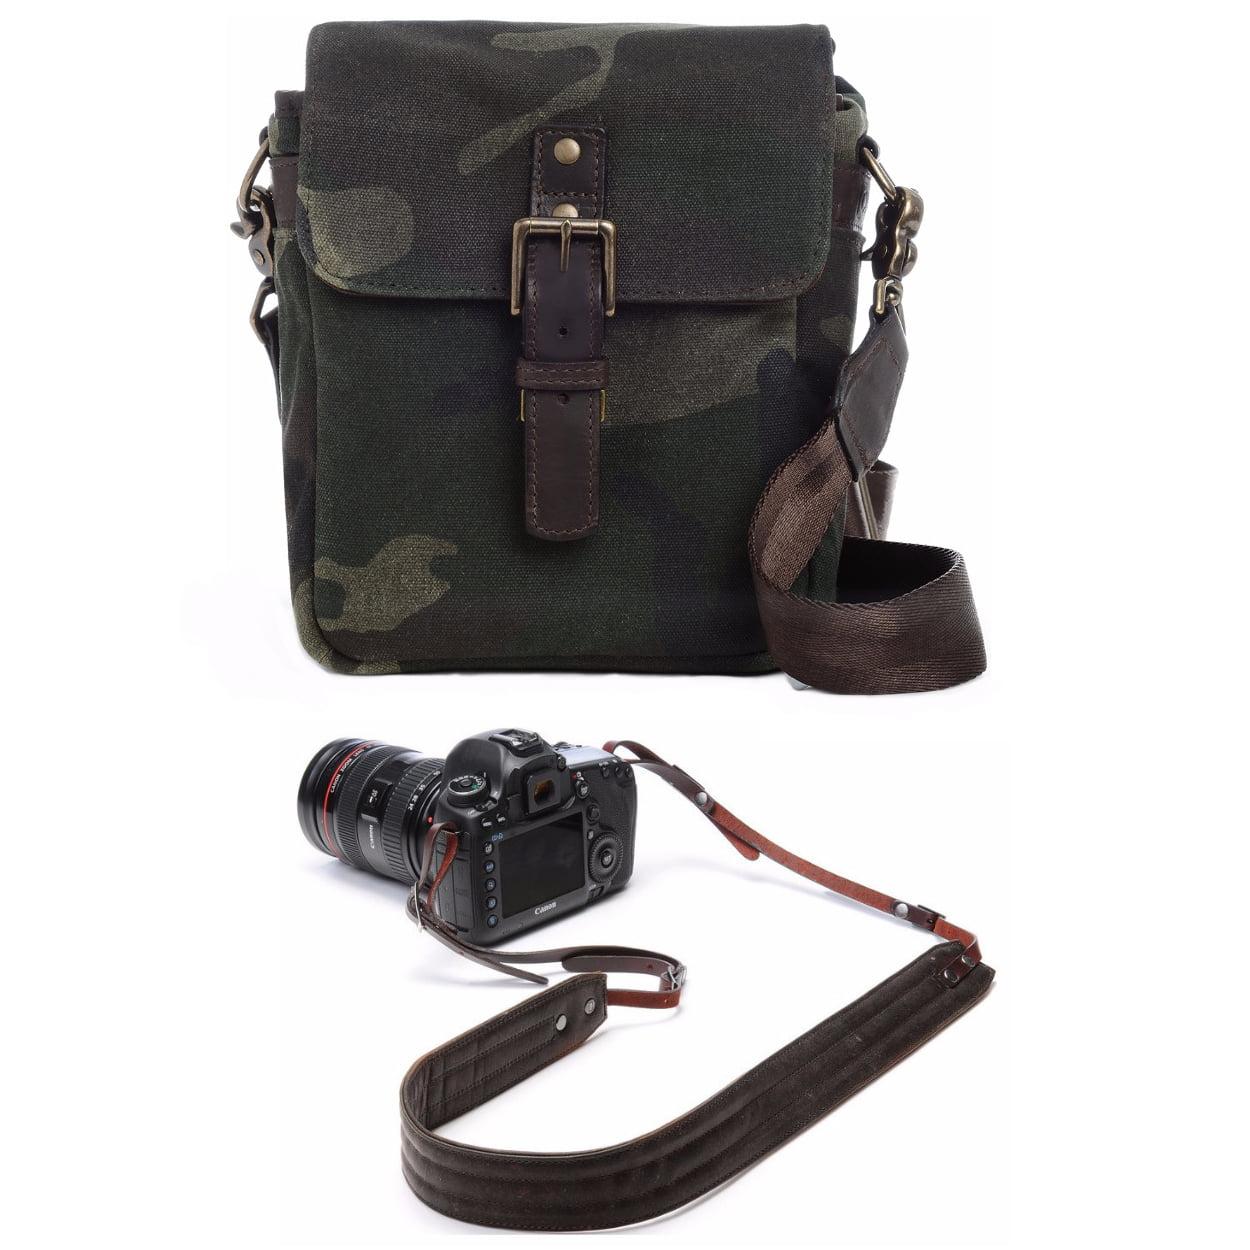 Camouflage Green ONA Bond Street Camera Messenger Bag and Insert